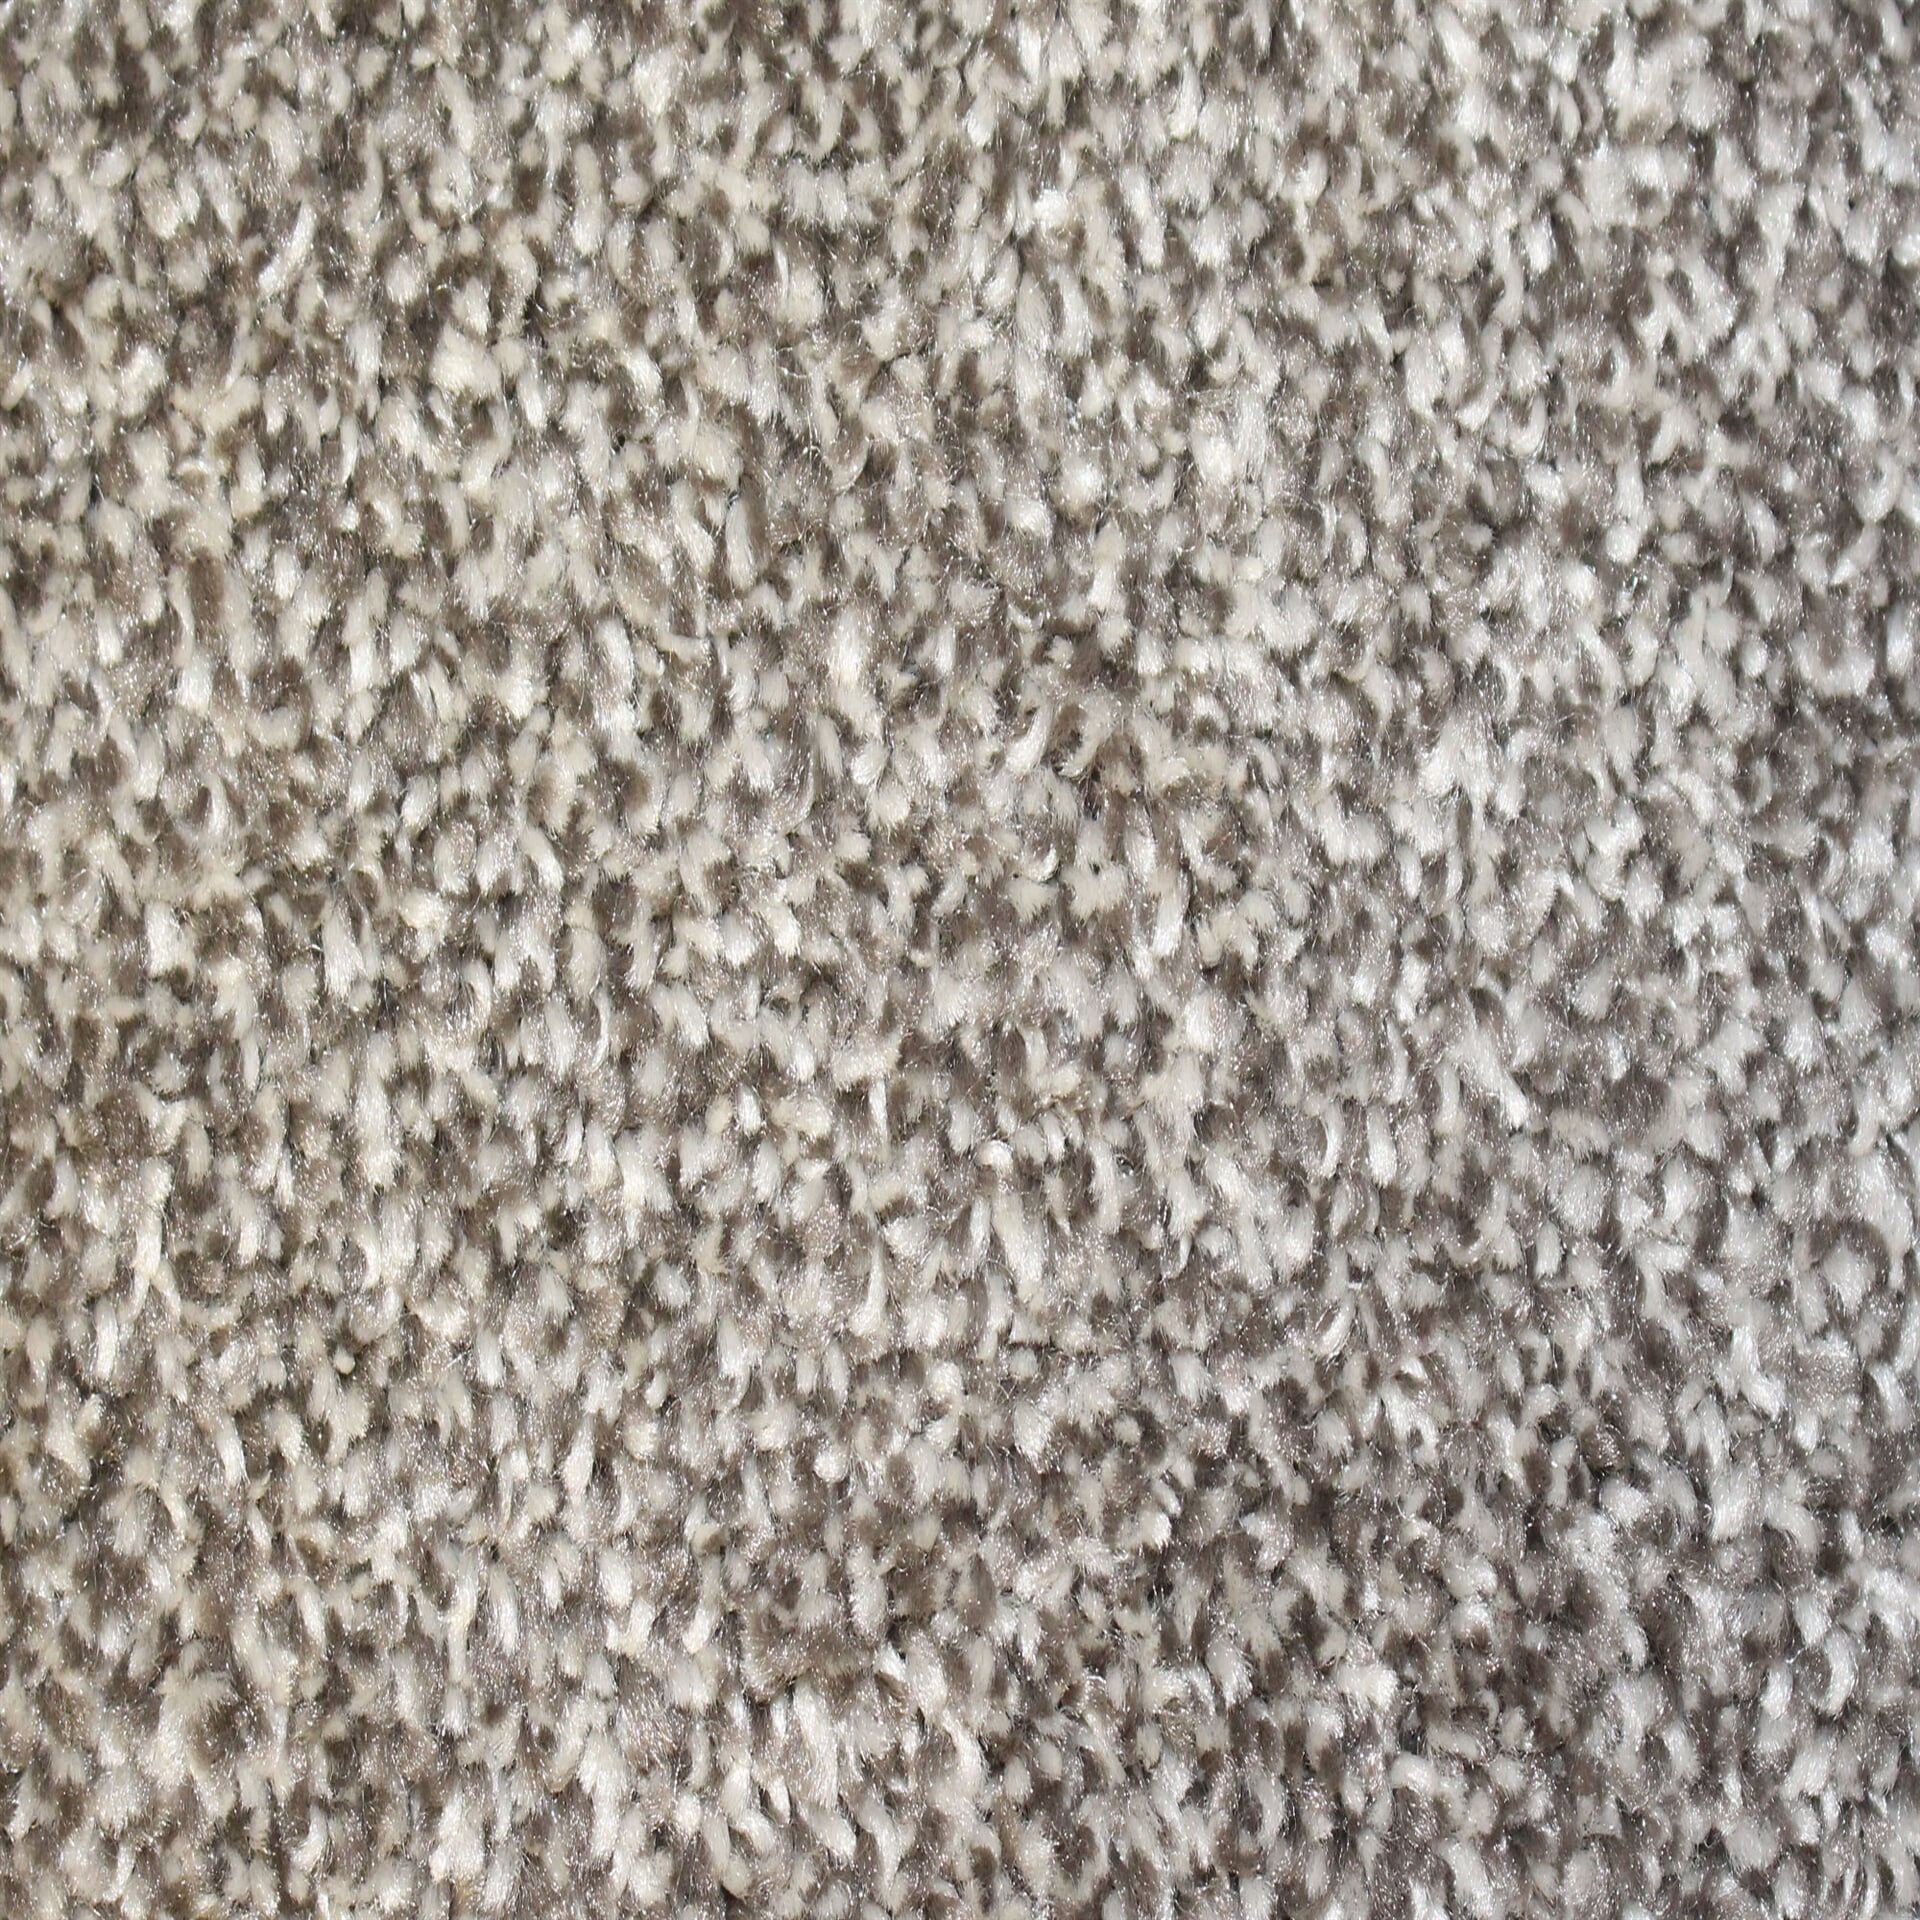 Genstock Pledge carpet in Enchant from General Floor